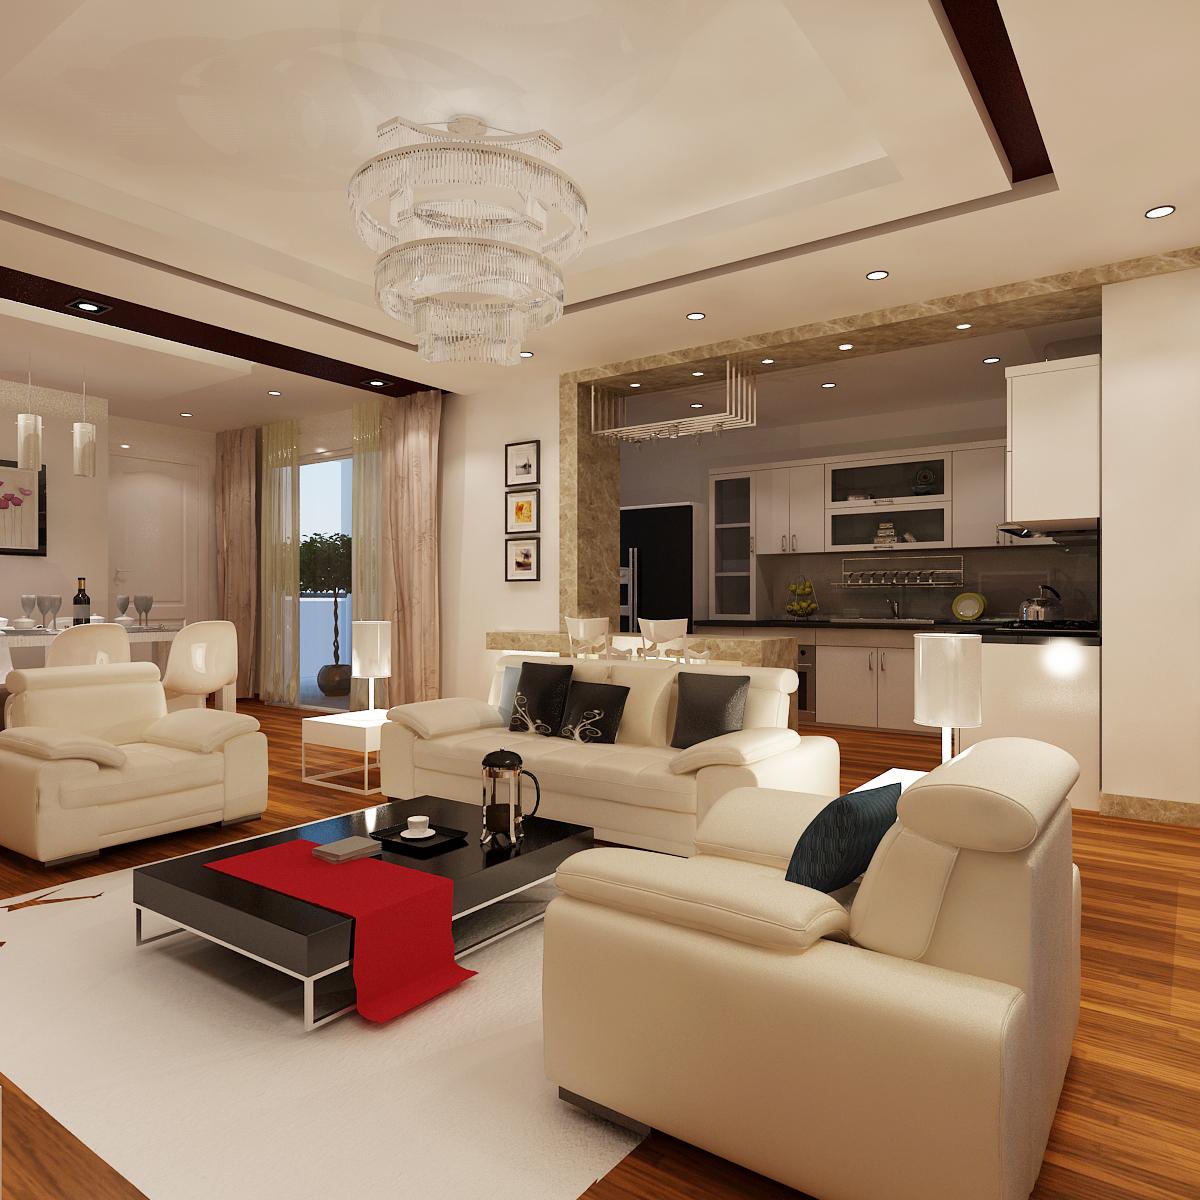 3d Max Kitchen Interior Design: Luxury Detailed House Cutaway 3D Model 3D Model